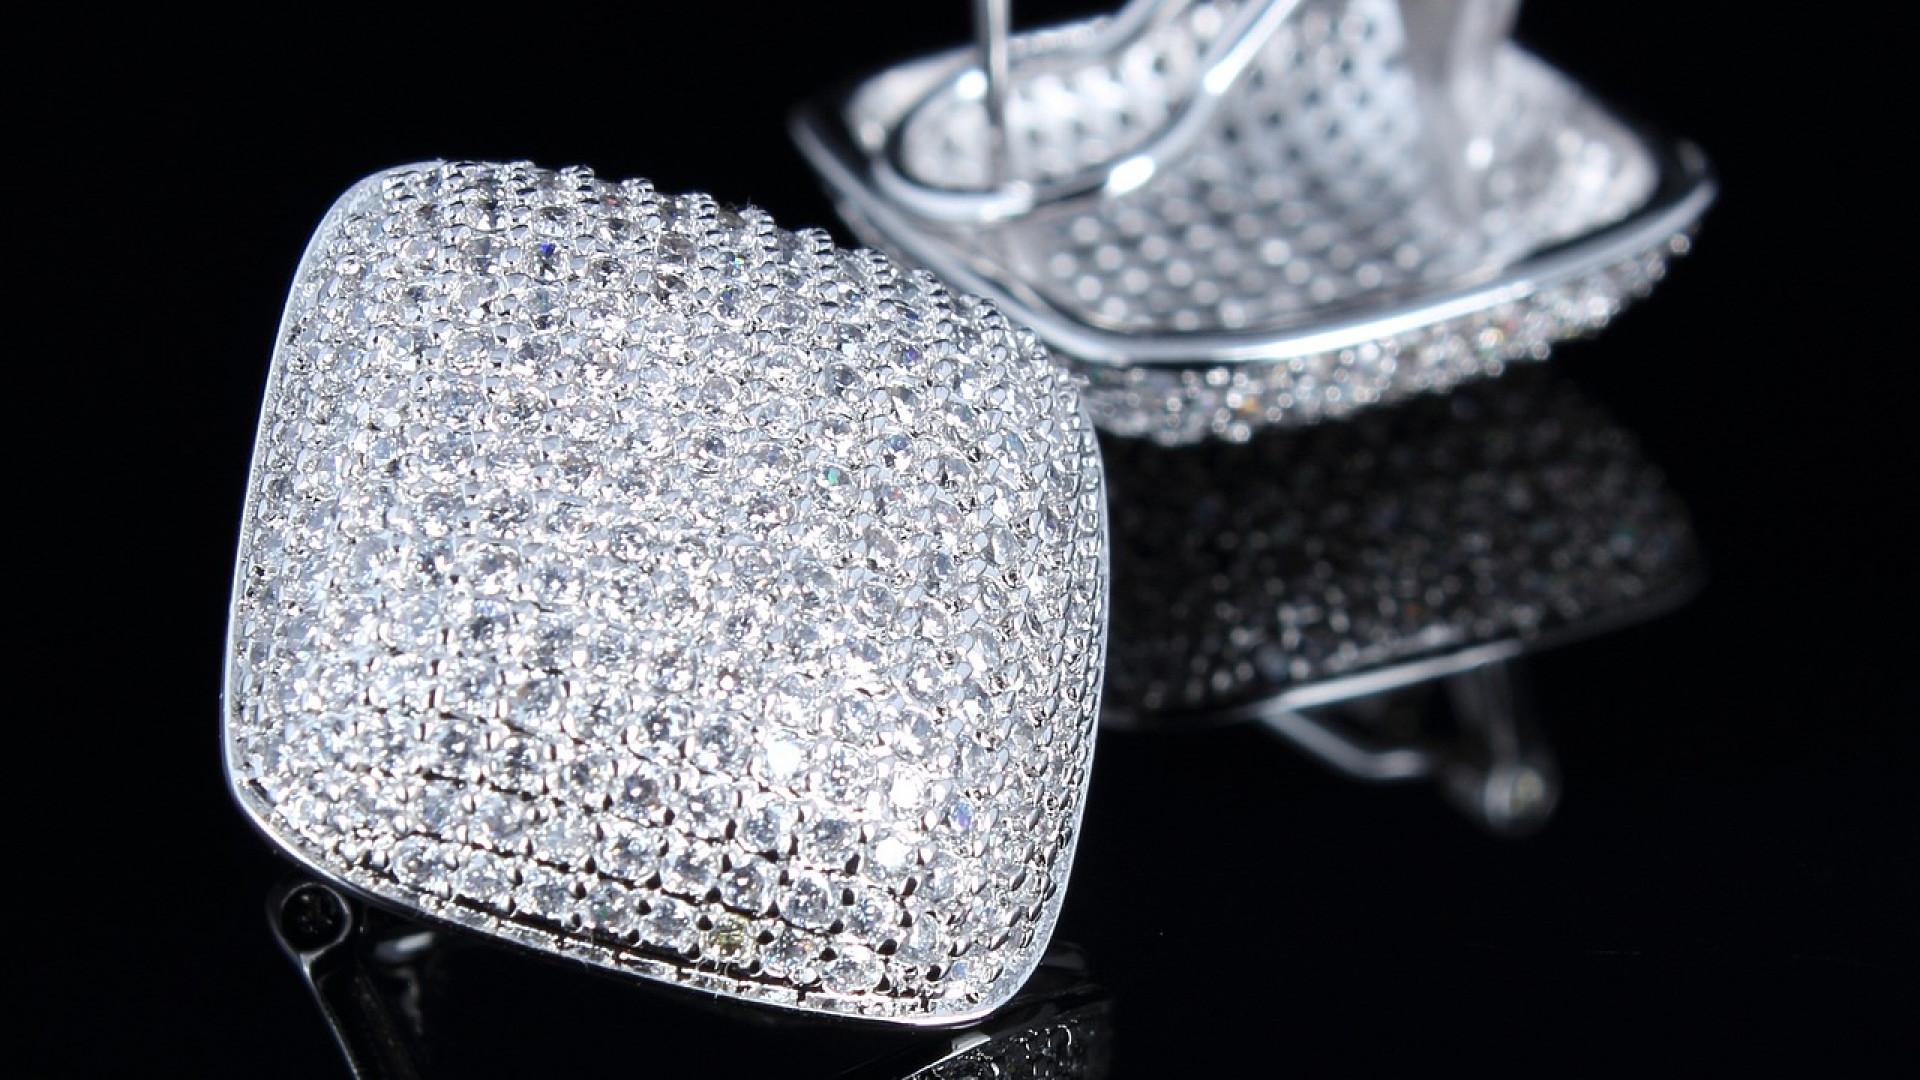 f1a3c03a4cb1b346cab5f5949e6d9243 - Le cristal de Swarovski, une tendance actuelle